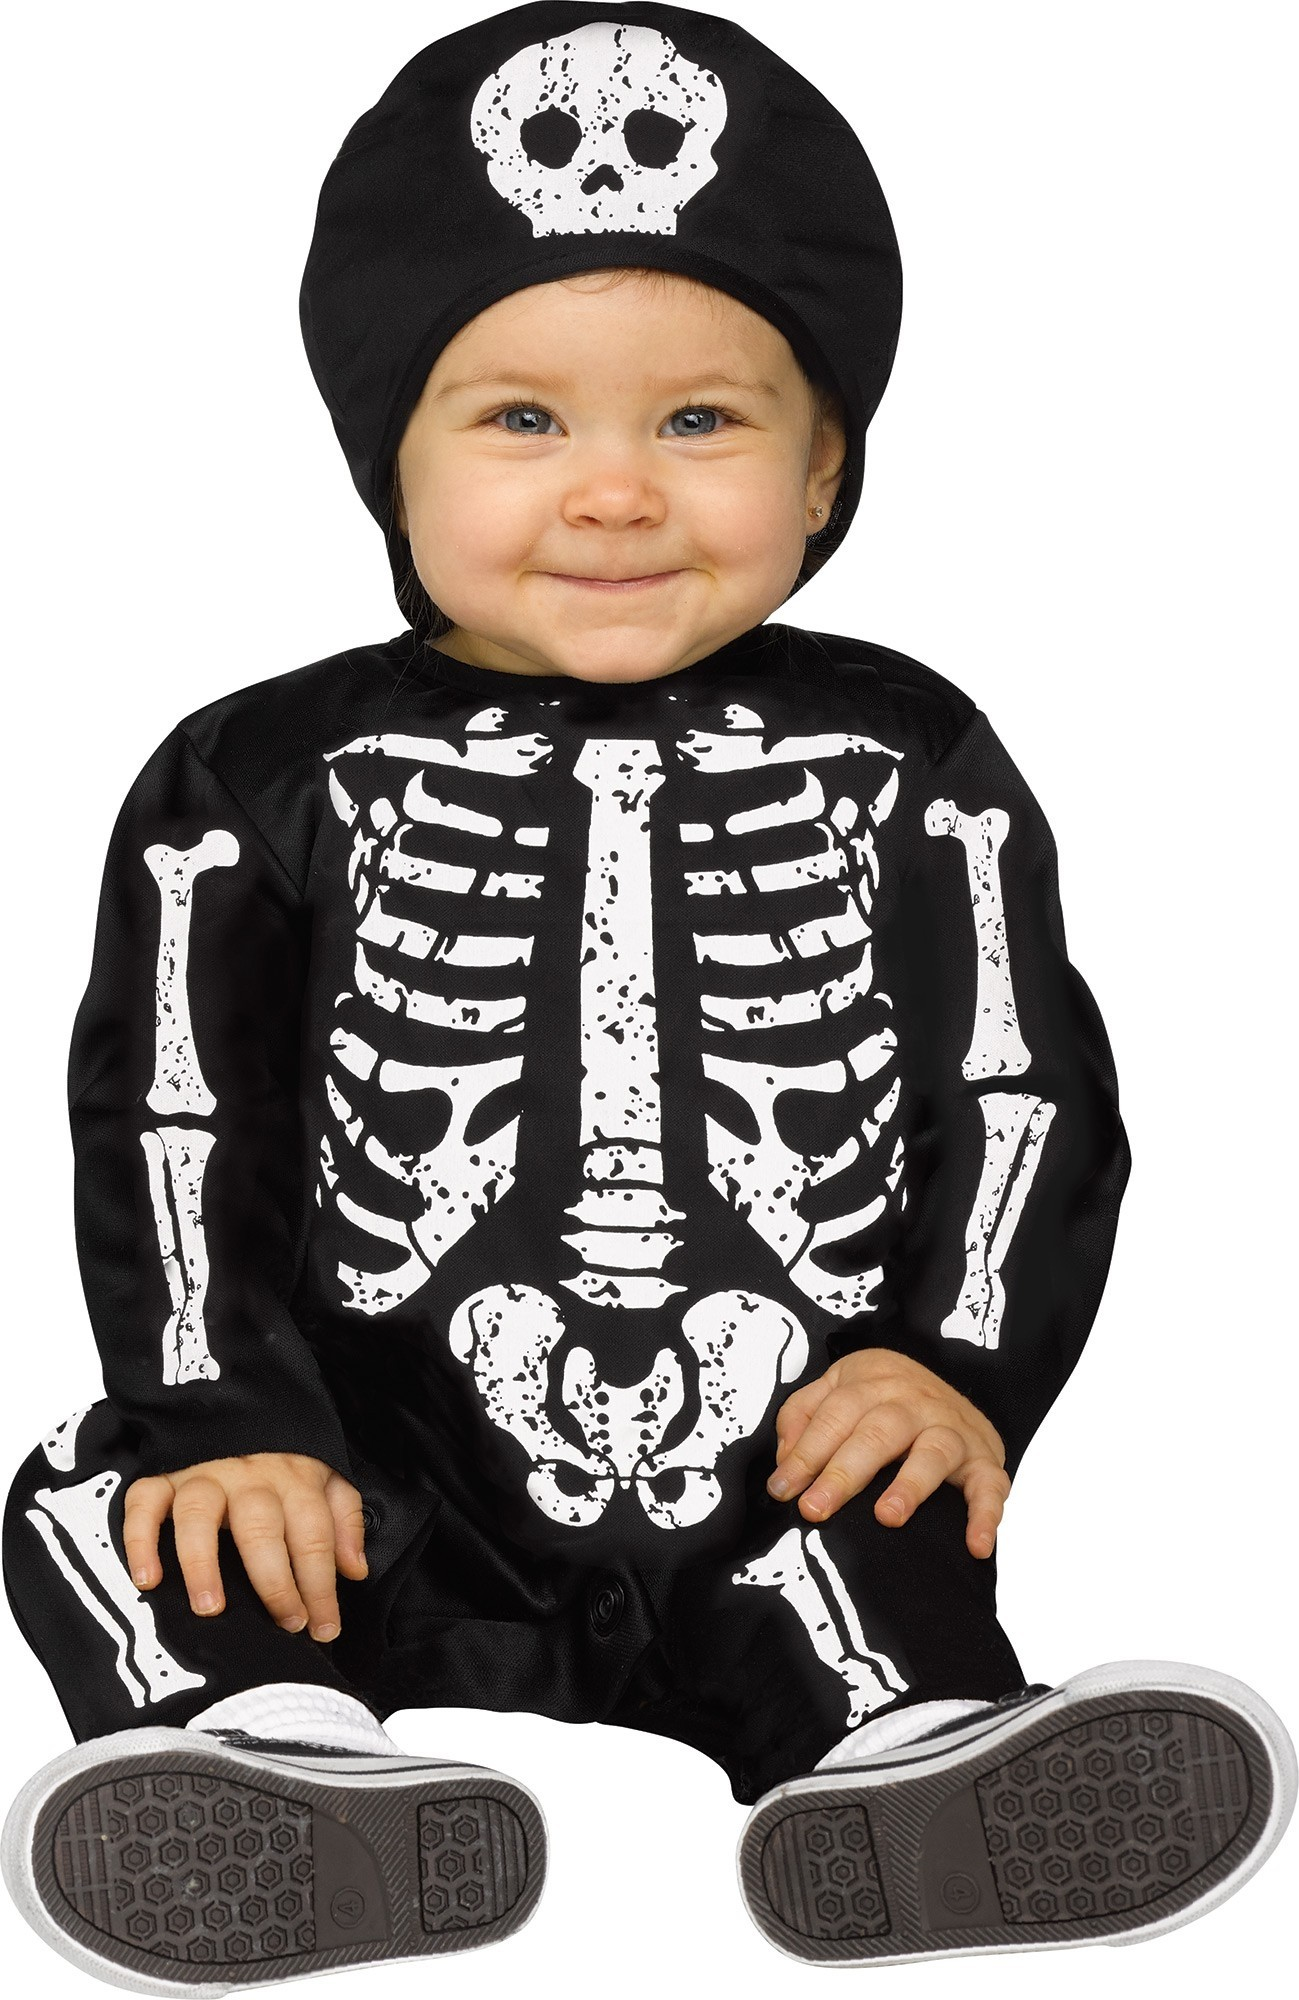 Костюм малыша-скелетона белый (24-26) костюм пони 24 26